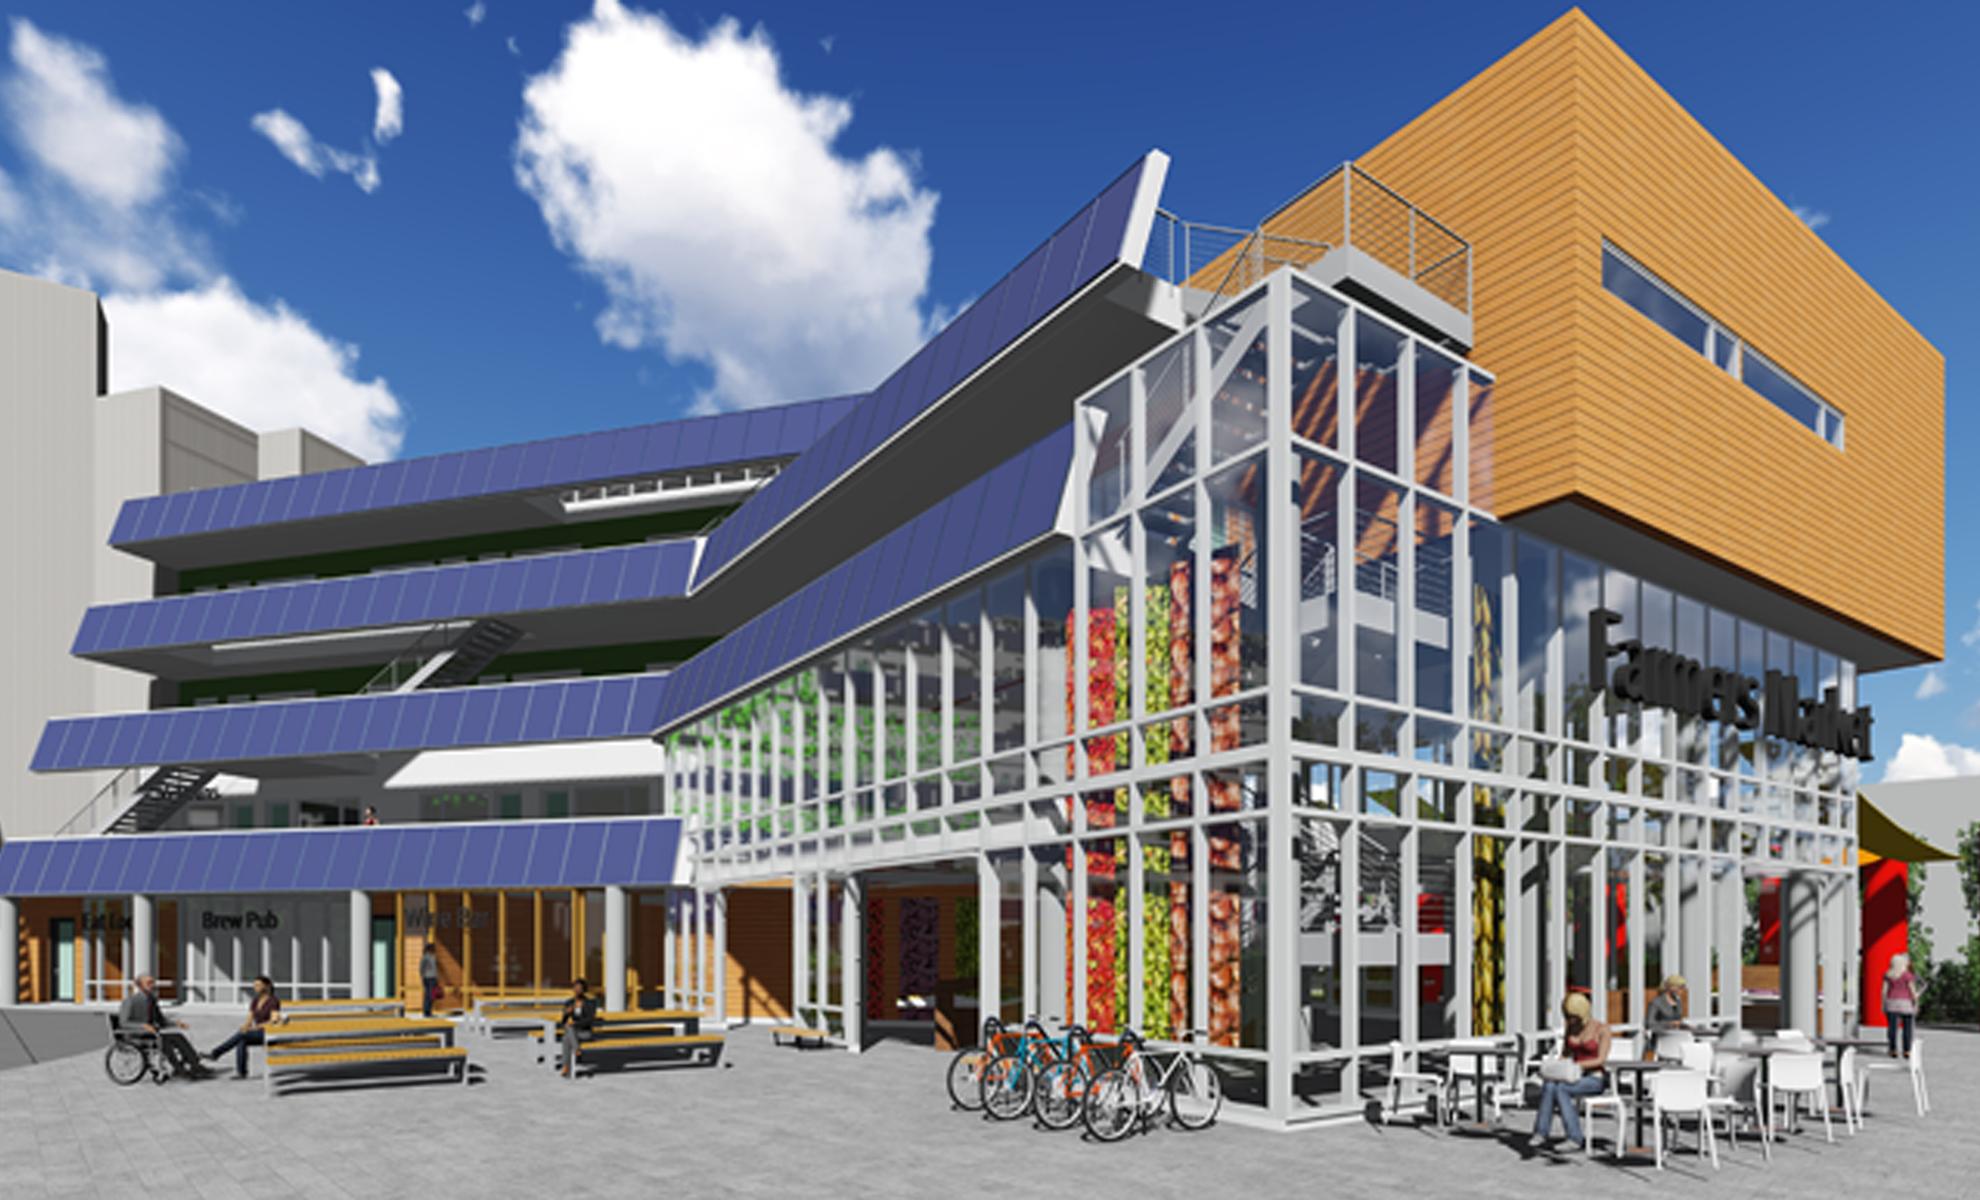 davis studio architect win 6 community